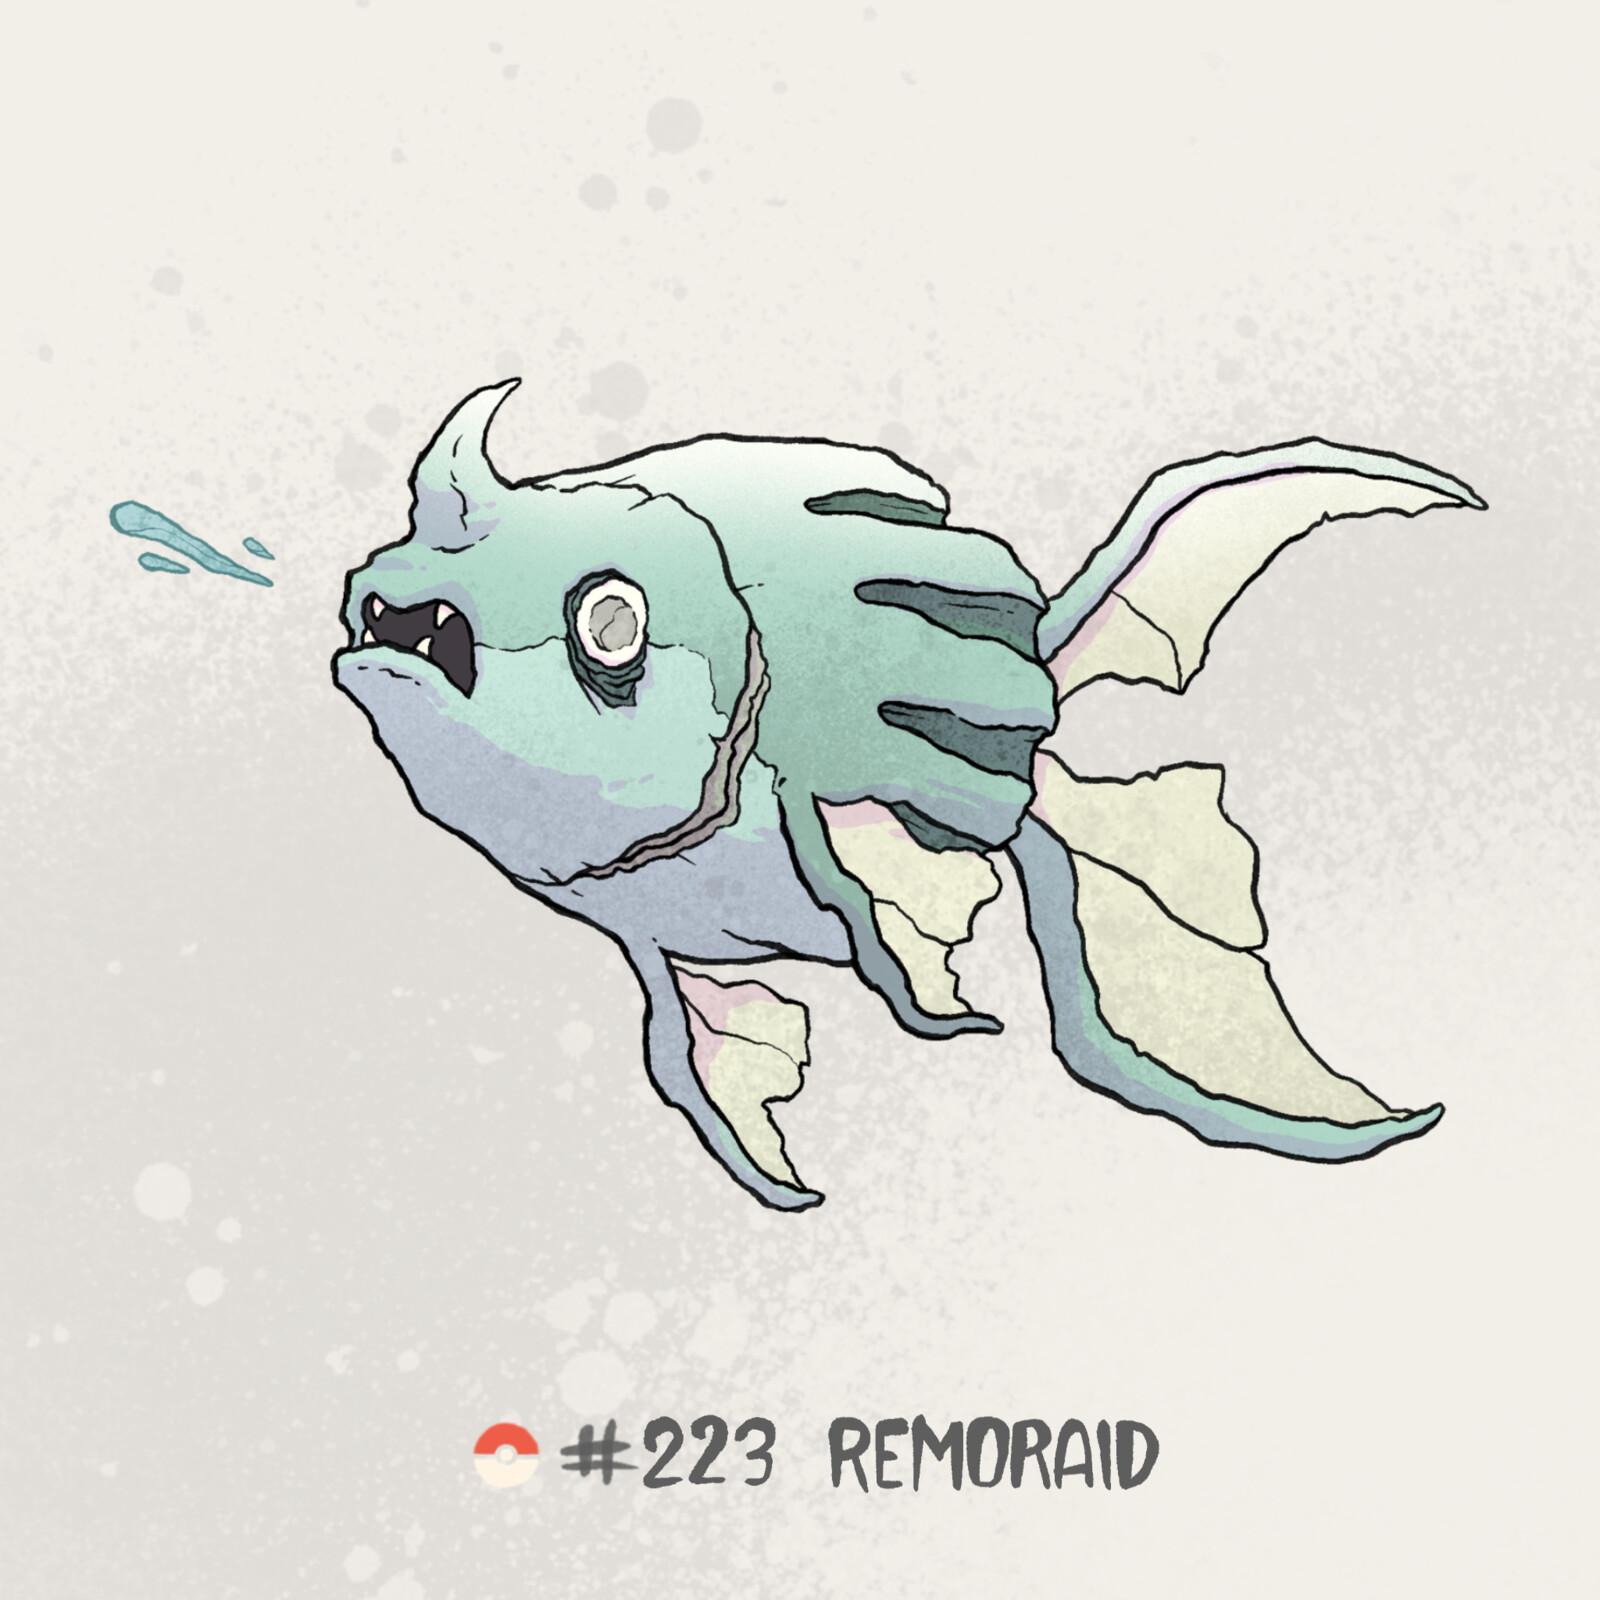 #223 Remoraid